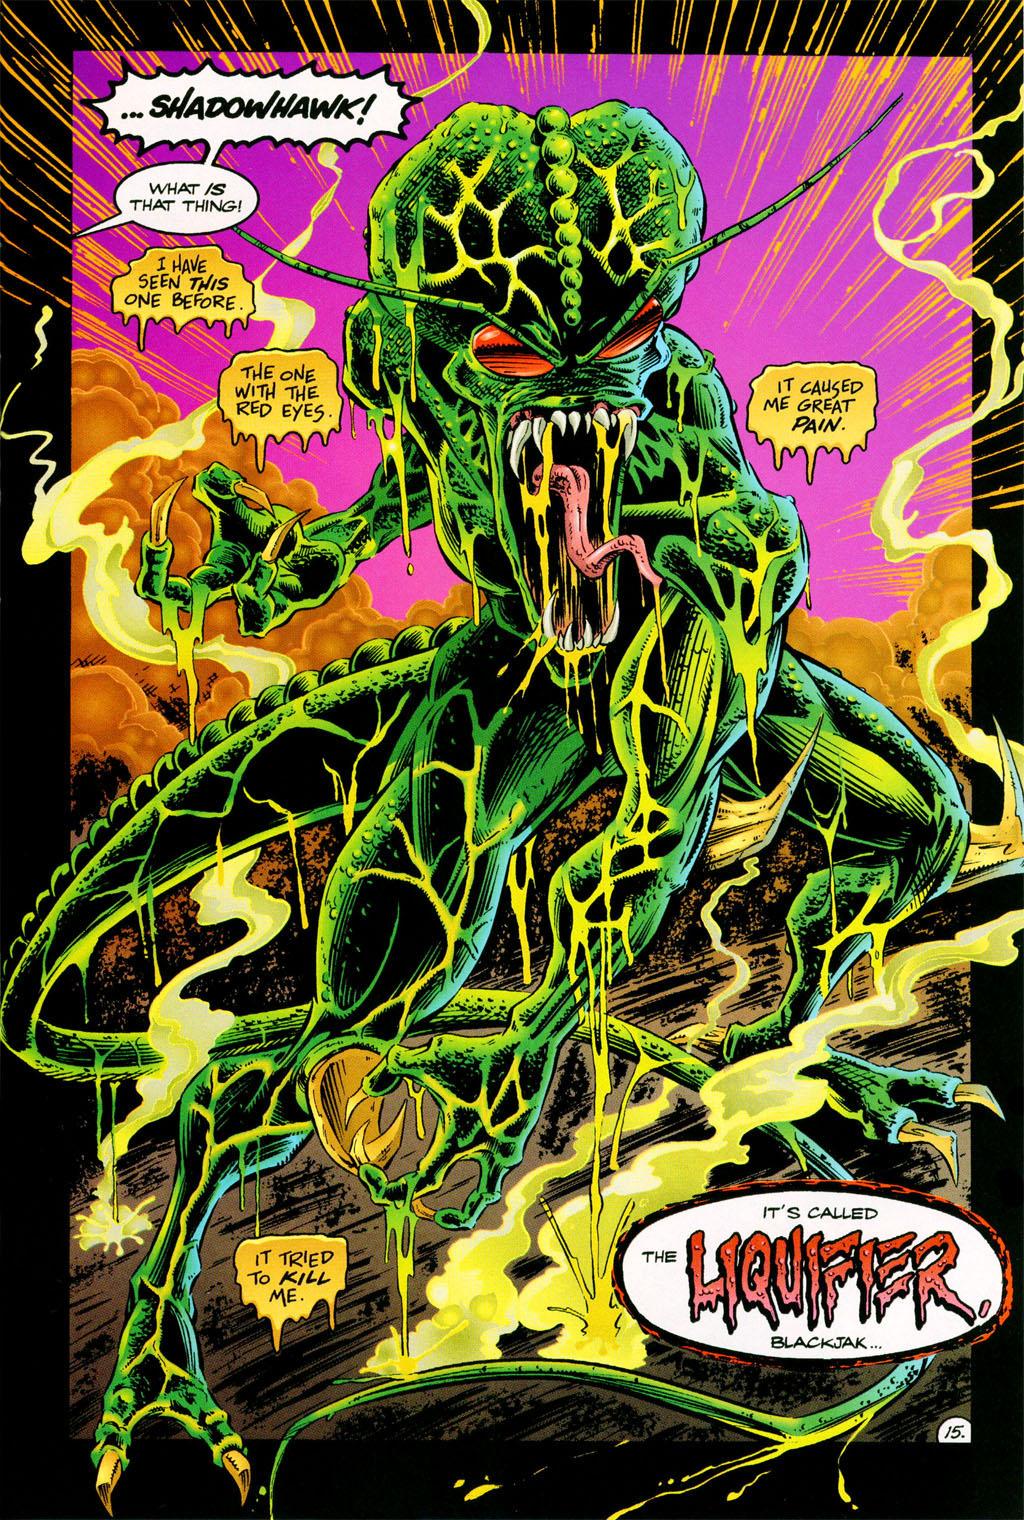 Read online ShadowHawk comic -  Issue #11 - 13